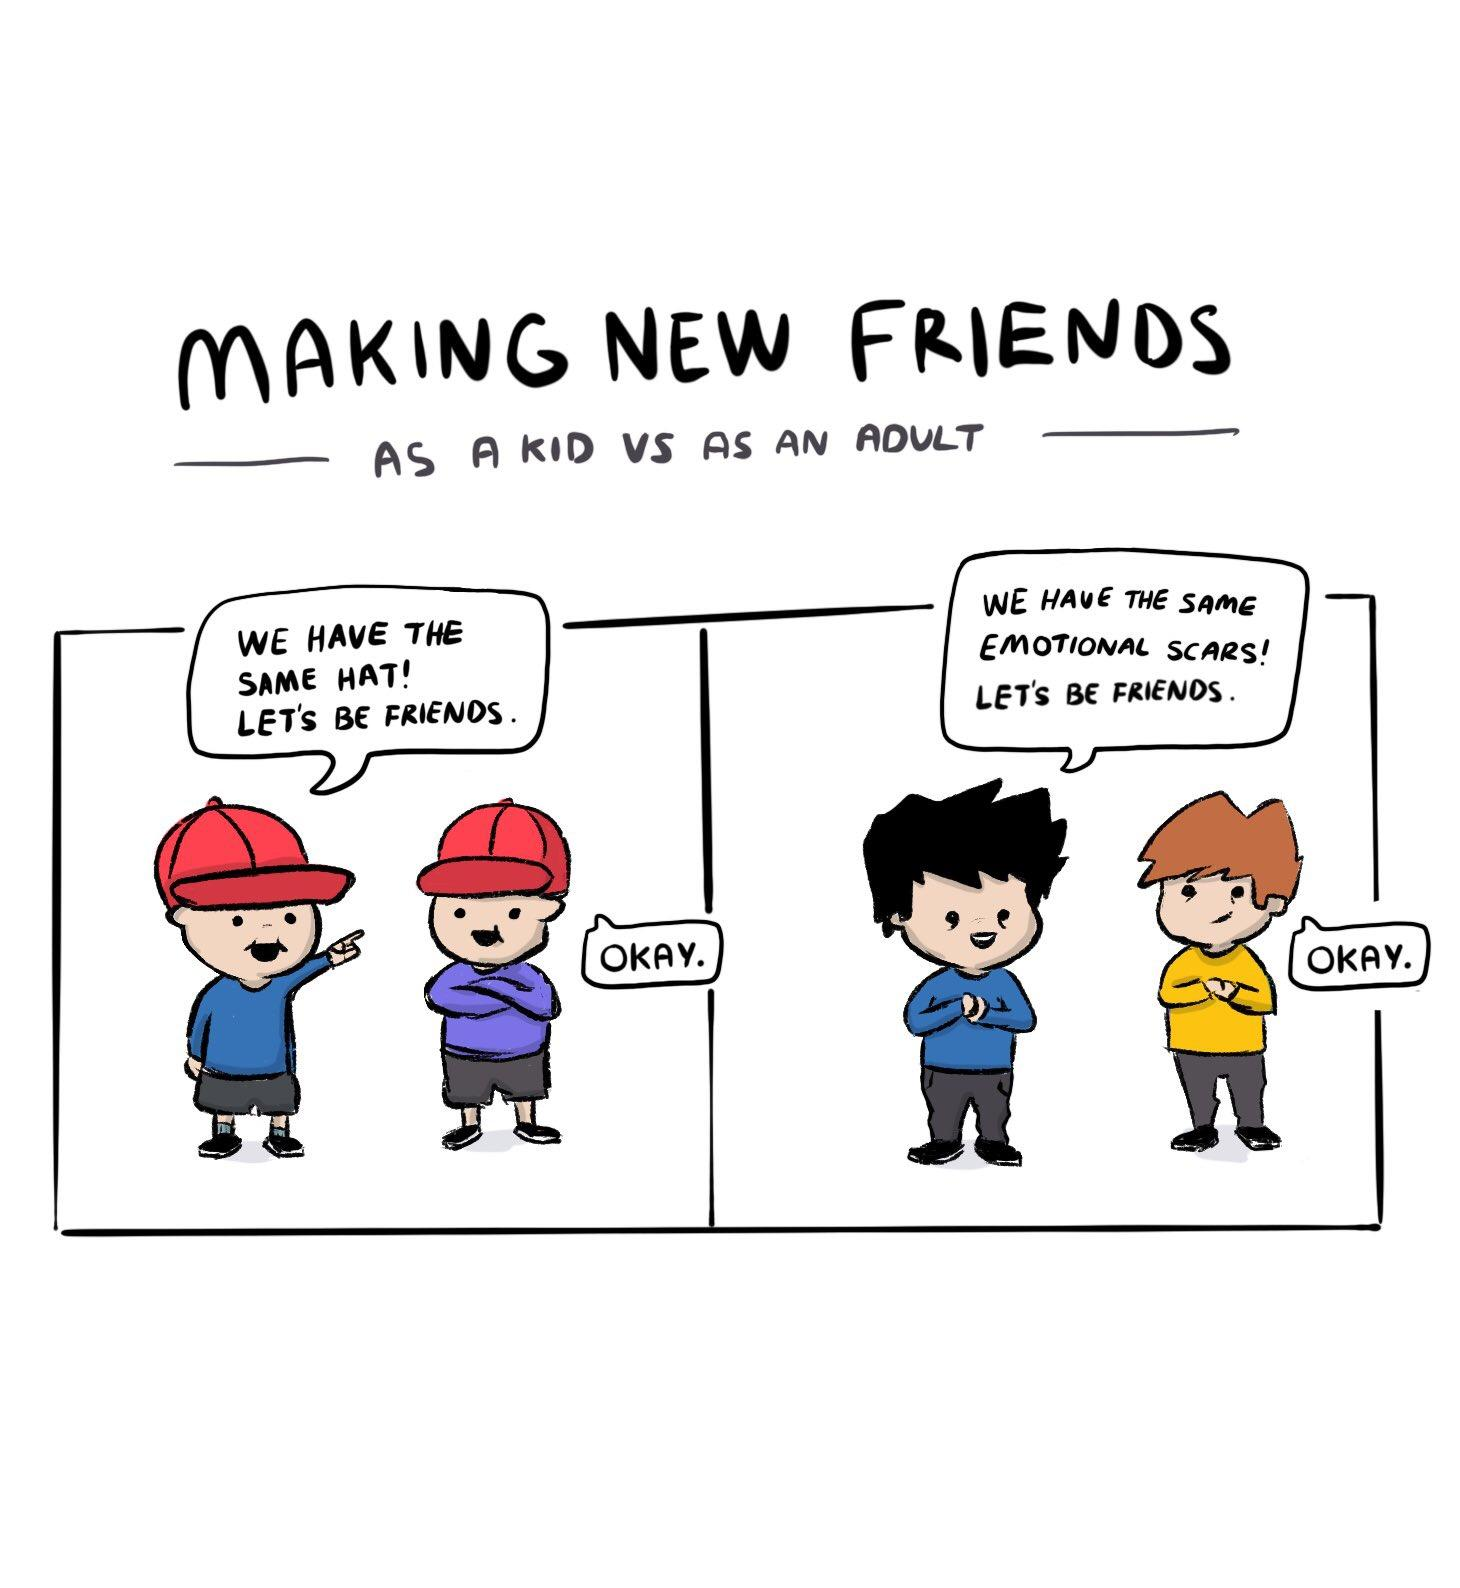 Making New Friends Oc Comics